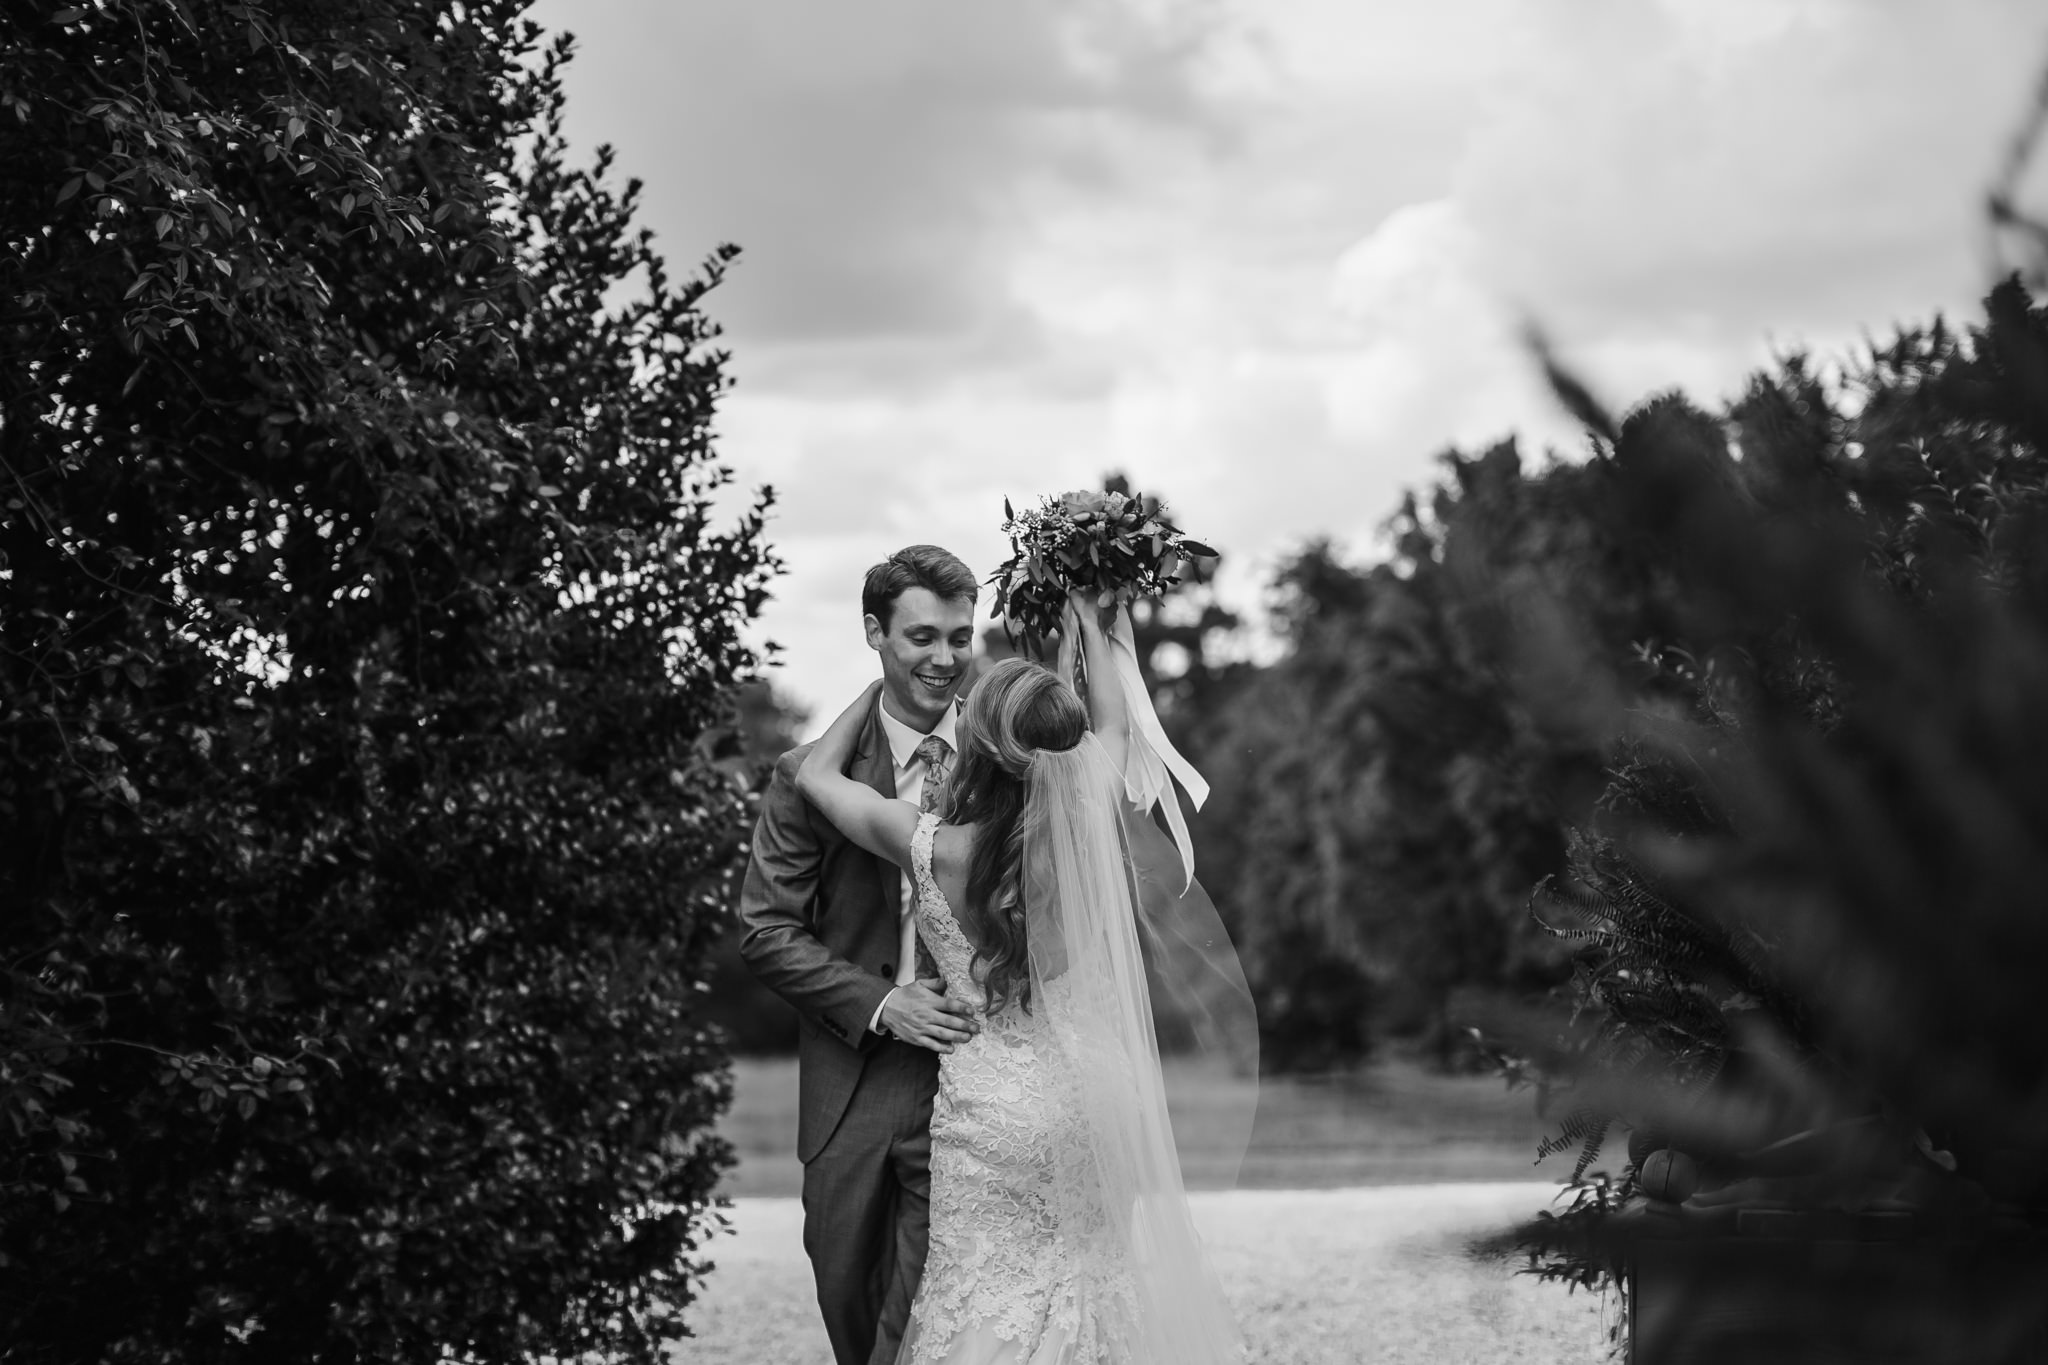 cassie-cook-photography-memphis-wedding-photographer-hedge-farm-wedding-venue-271.jpg